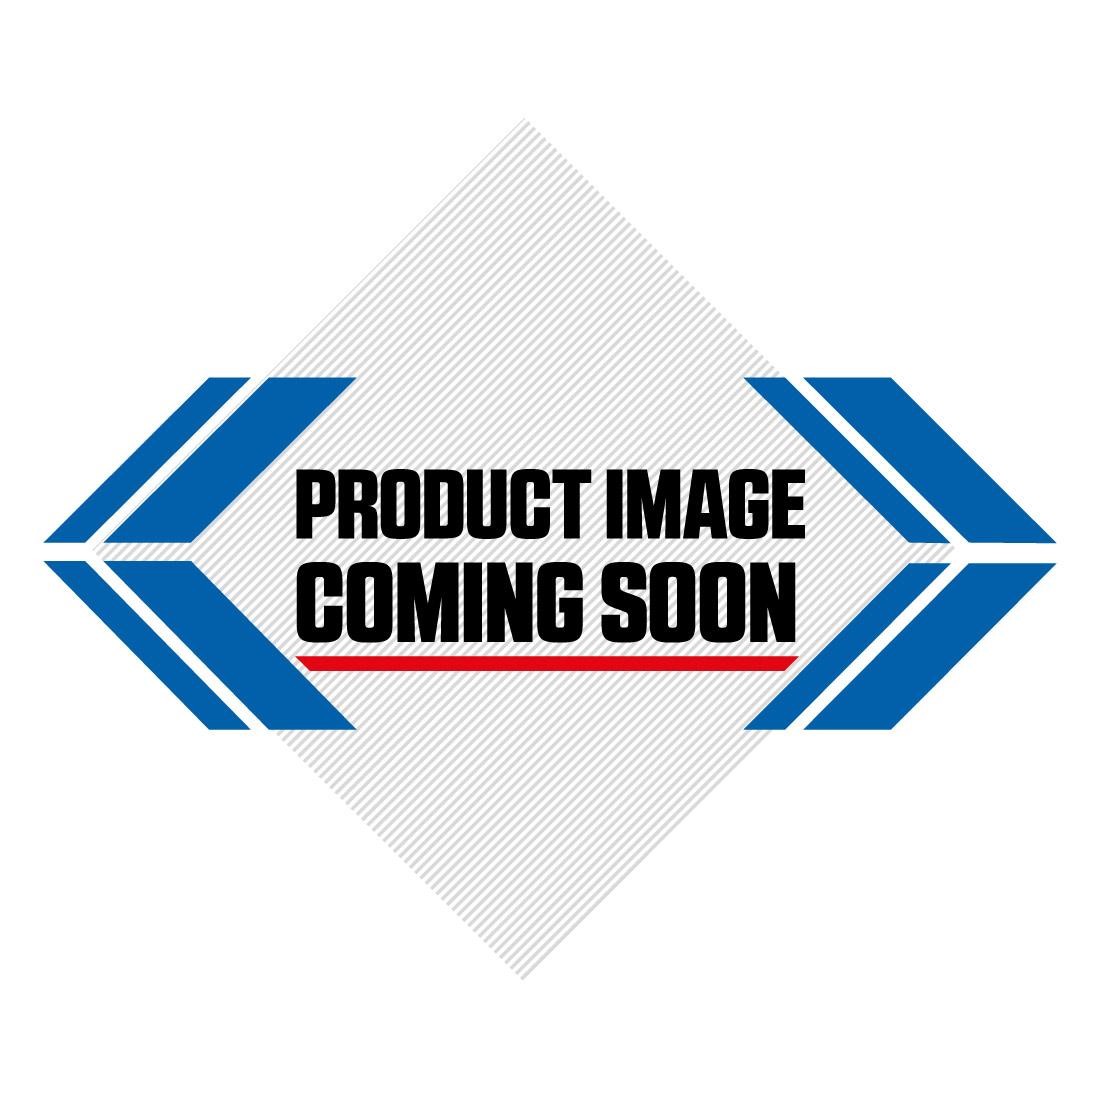 100% Armega Forecast Dual Pane Replacement Goggle Lens Image-2>